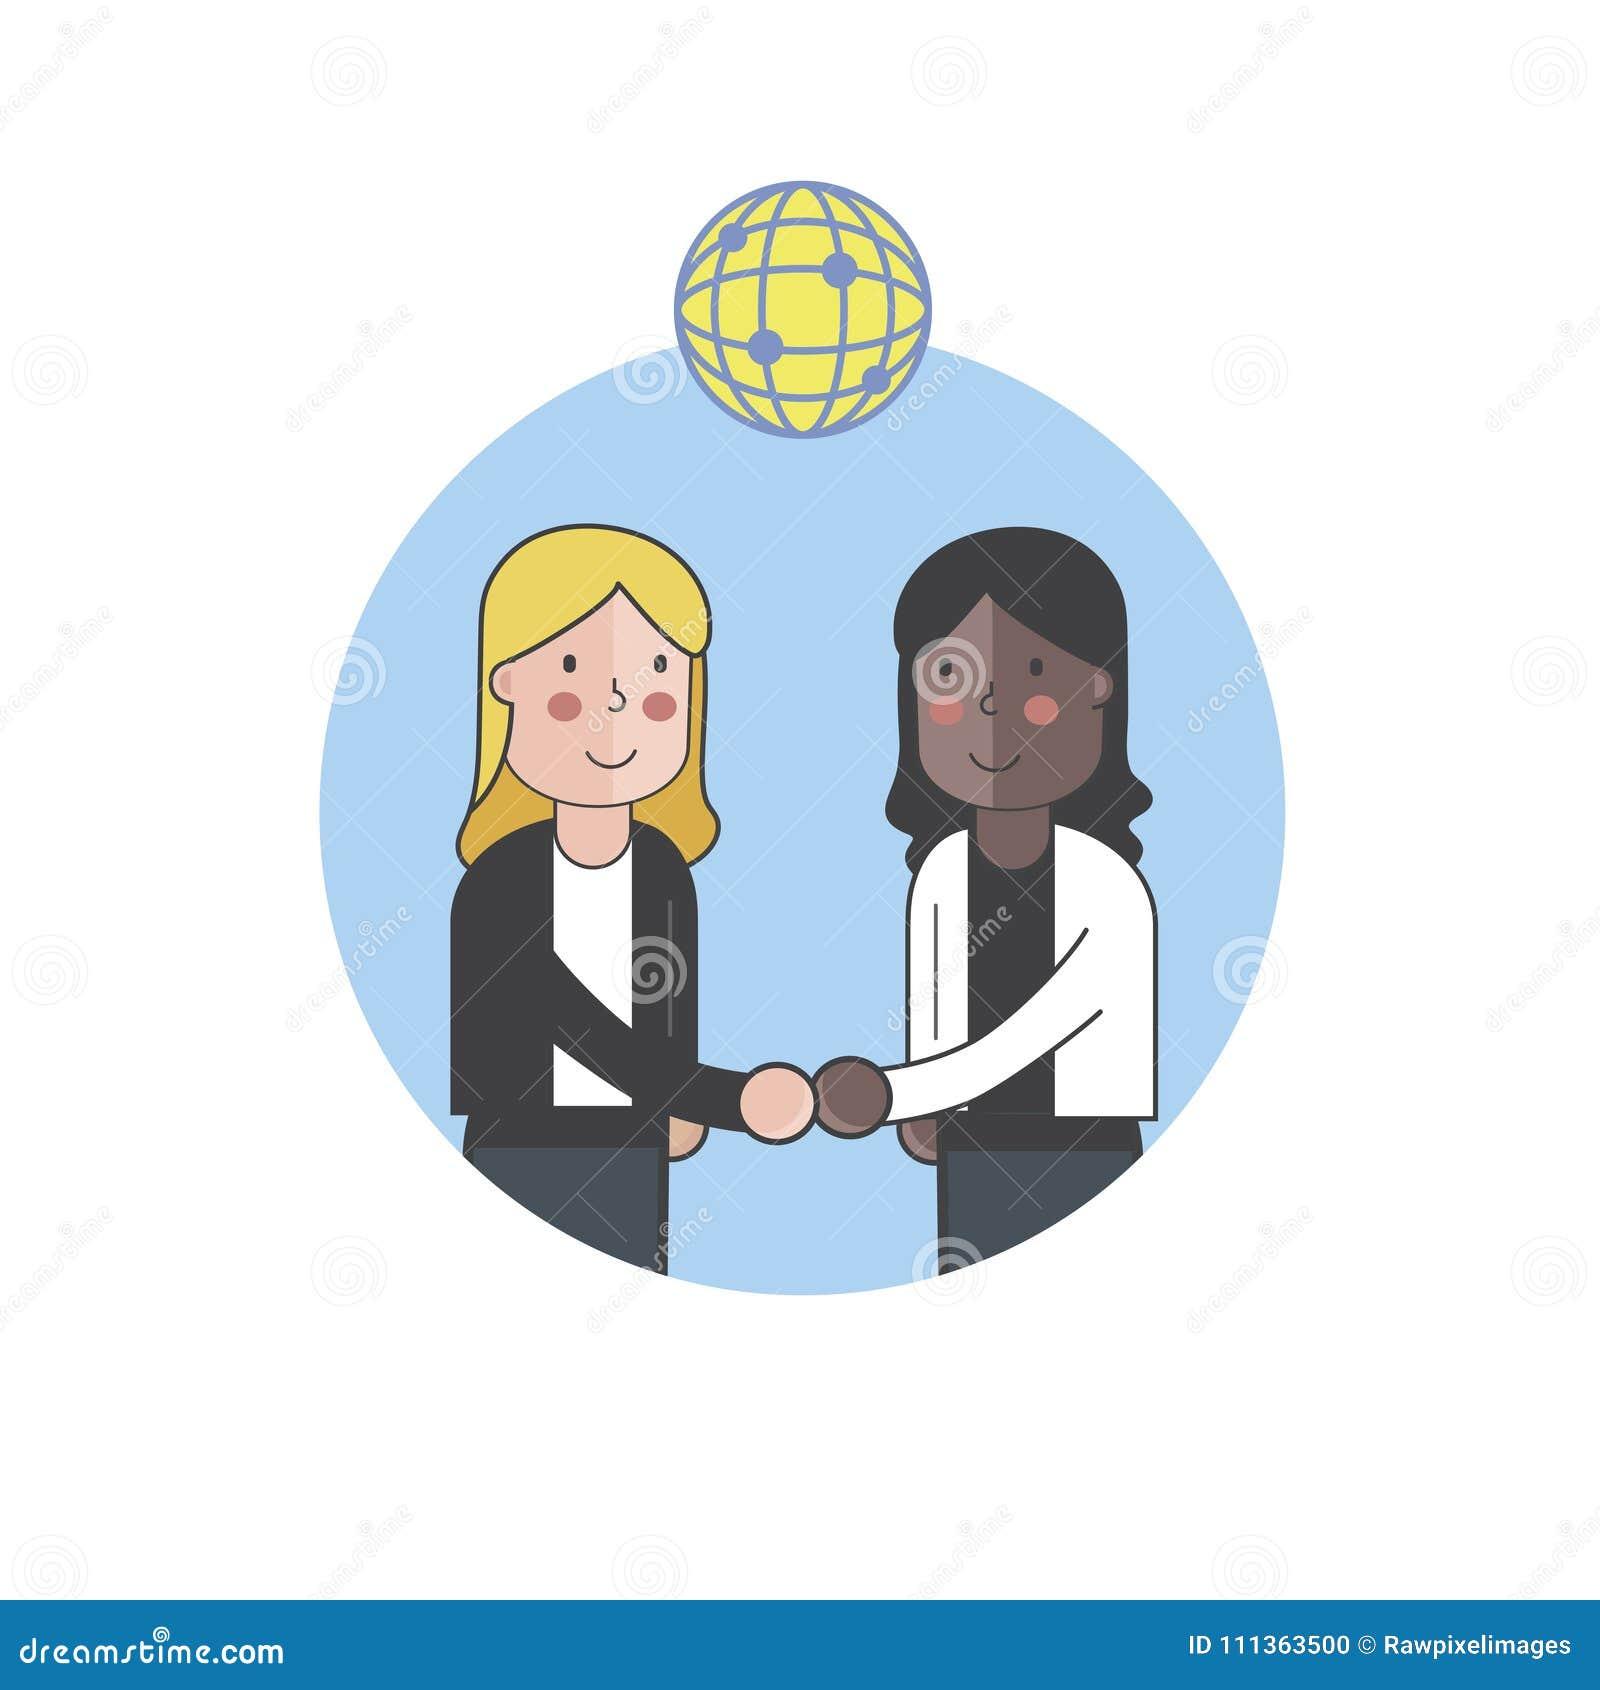 Avatar 3 2021: Two Women Shaking Hands Stock Illustrations